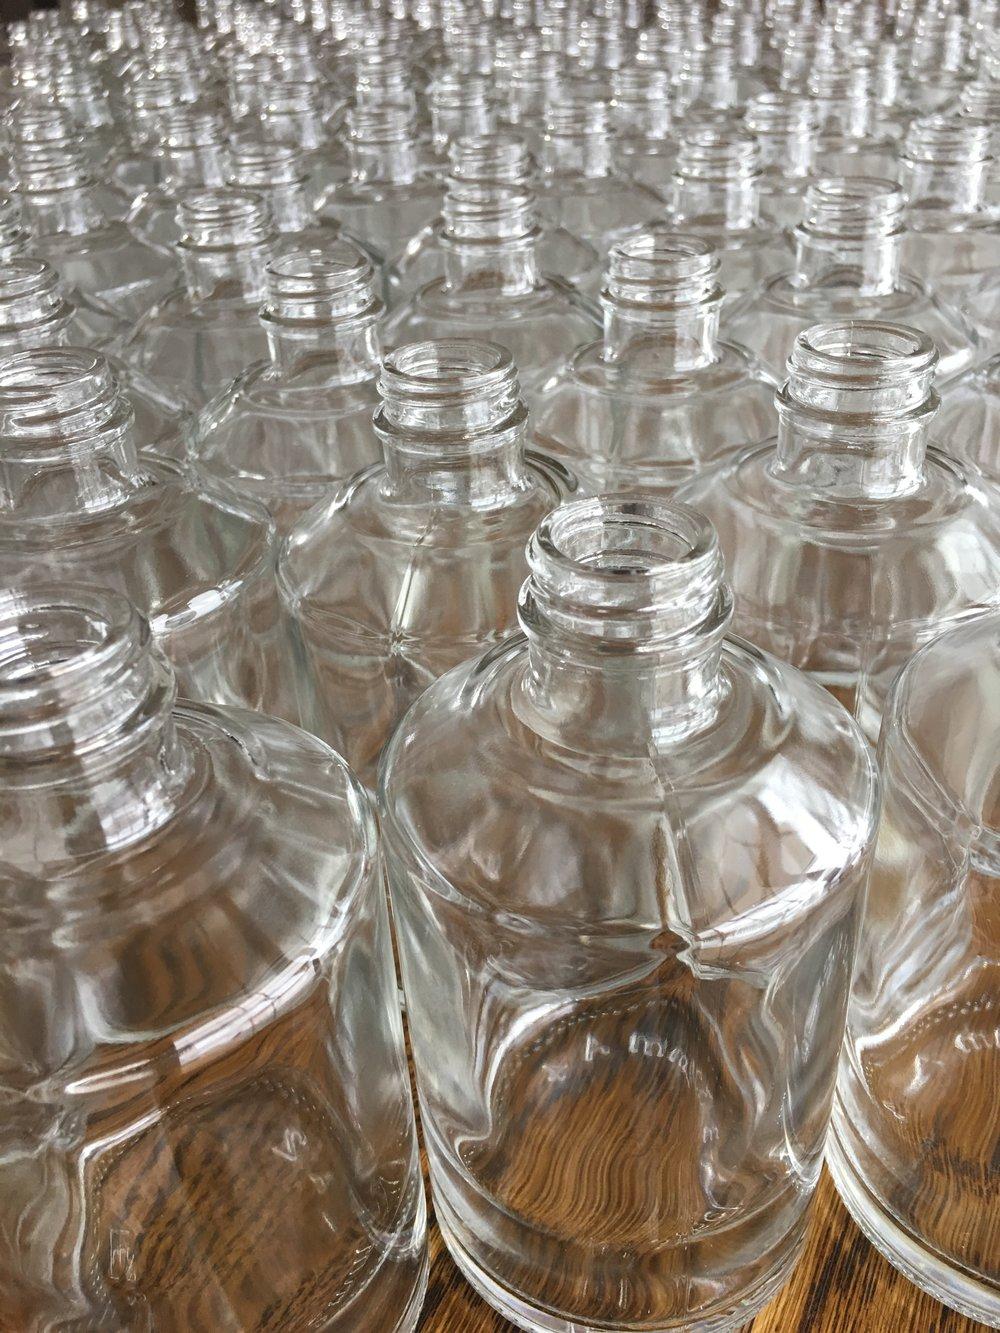 Quality glass bottles!